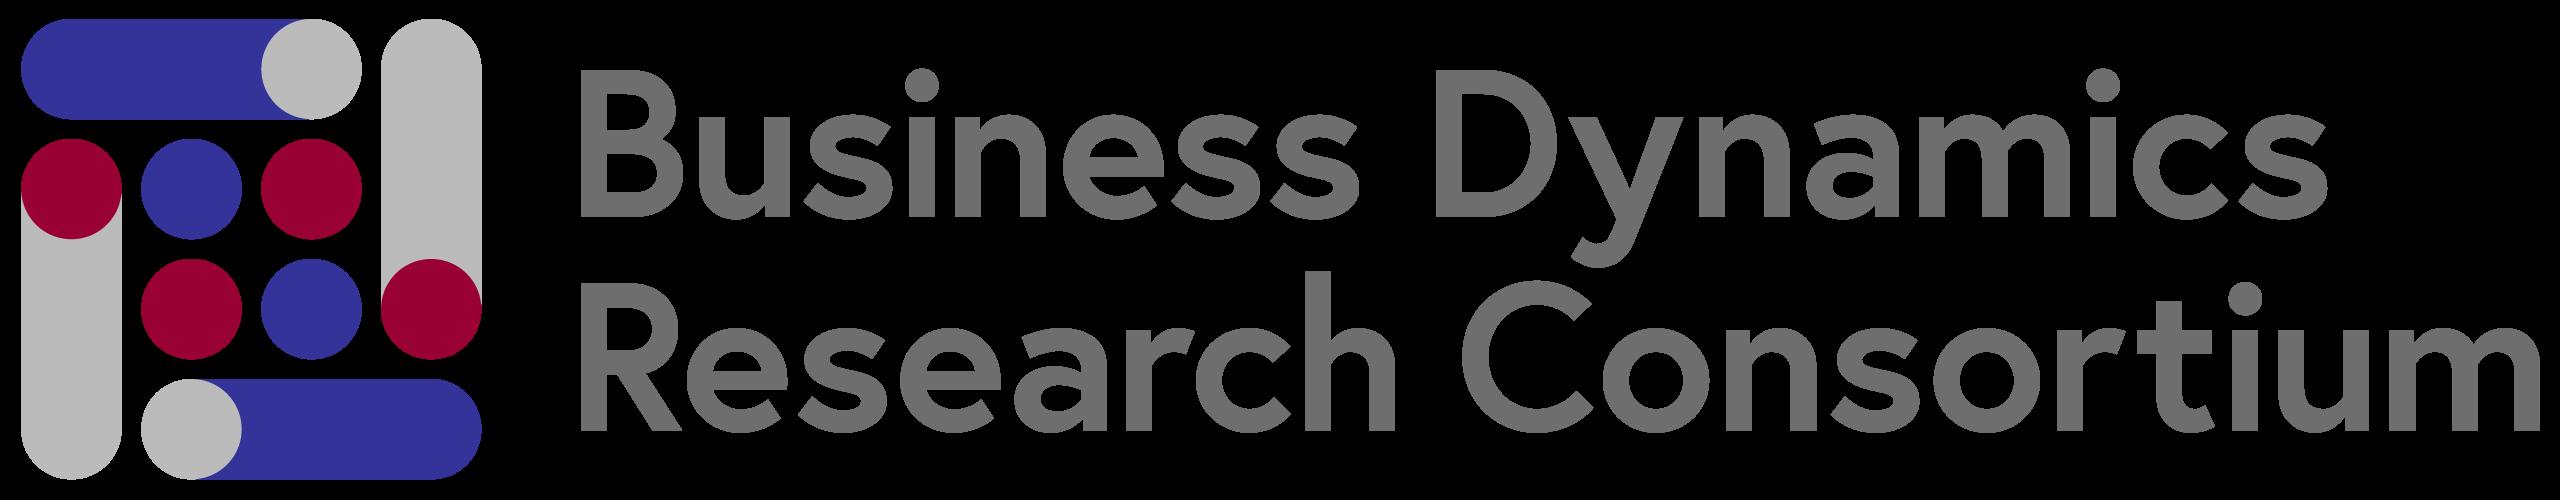 Business Dynamics Research Consortium